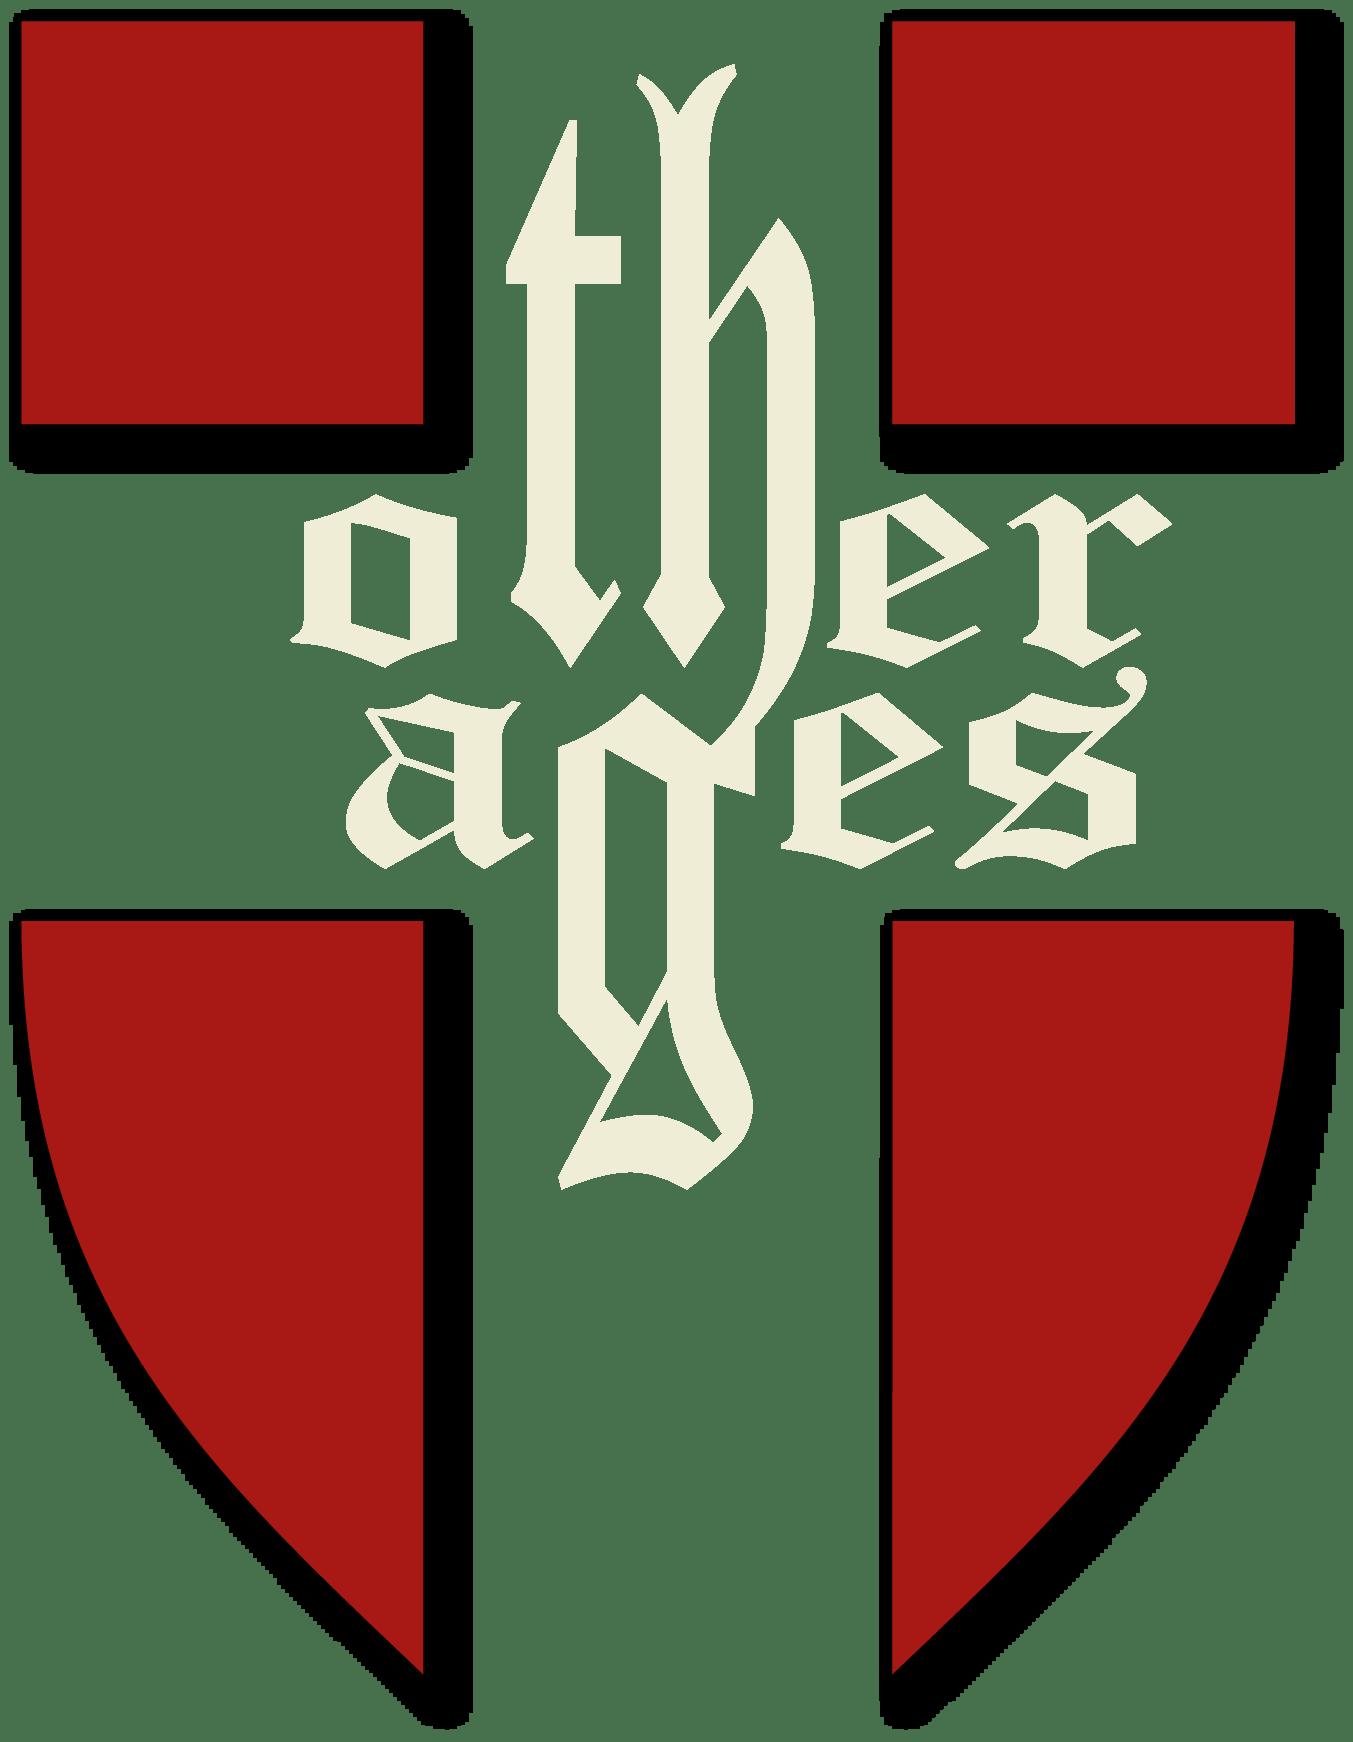 other ages - Rittermahl, Ritteressen, Ritterspiele, Burgentour, Mittelalterhochzeit, Dinnerevent, Weihnachtsfeier, Teamevent, Betriebsausflug, Betriebsfeier